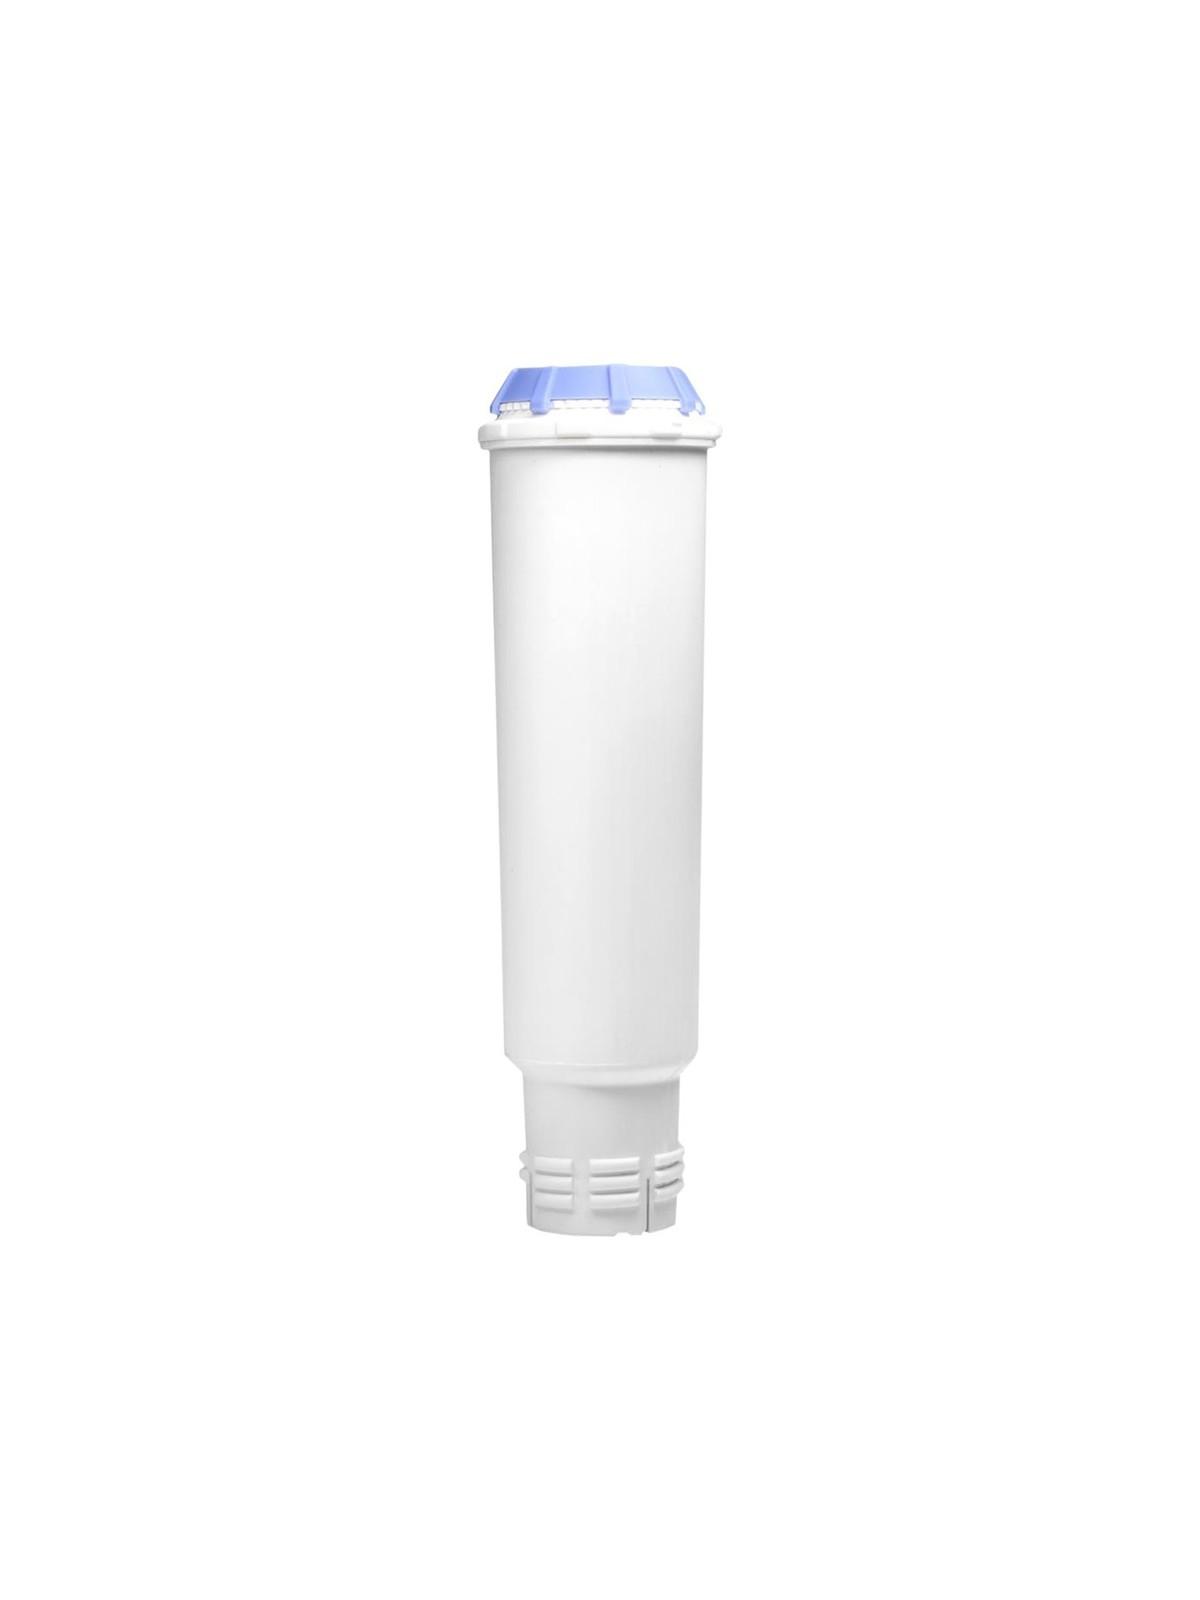 MELITTA Claris Pro Aqua Water Filter Cartridge